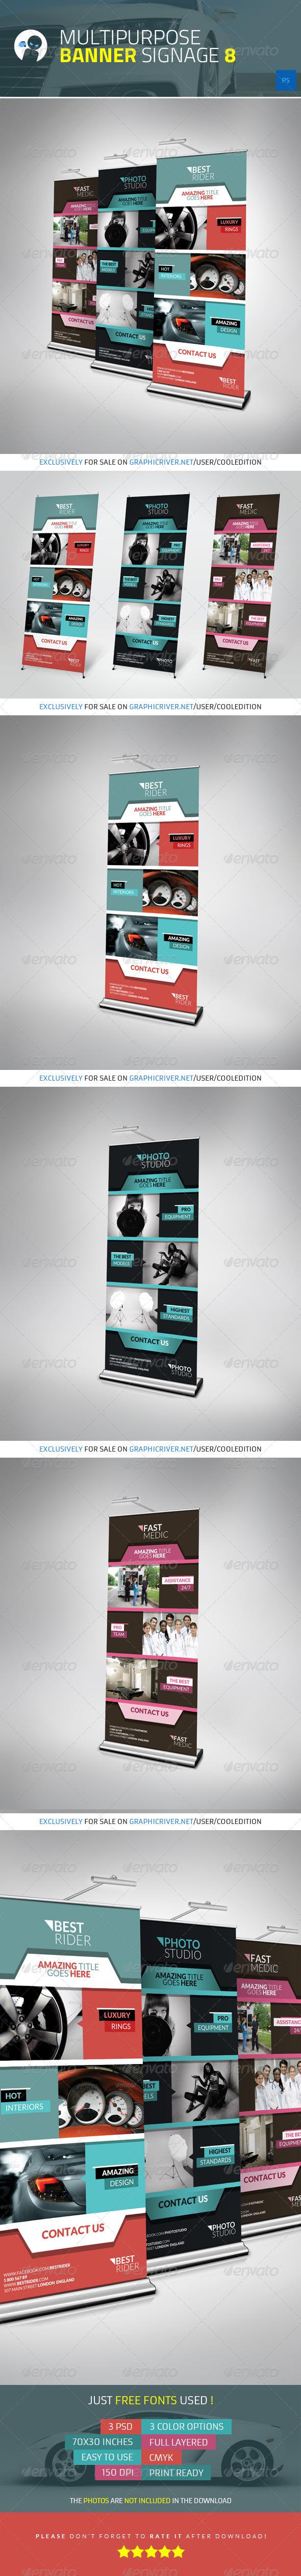 GraphicRiver Multipurpose Banner Signage 8 4371508